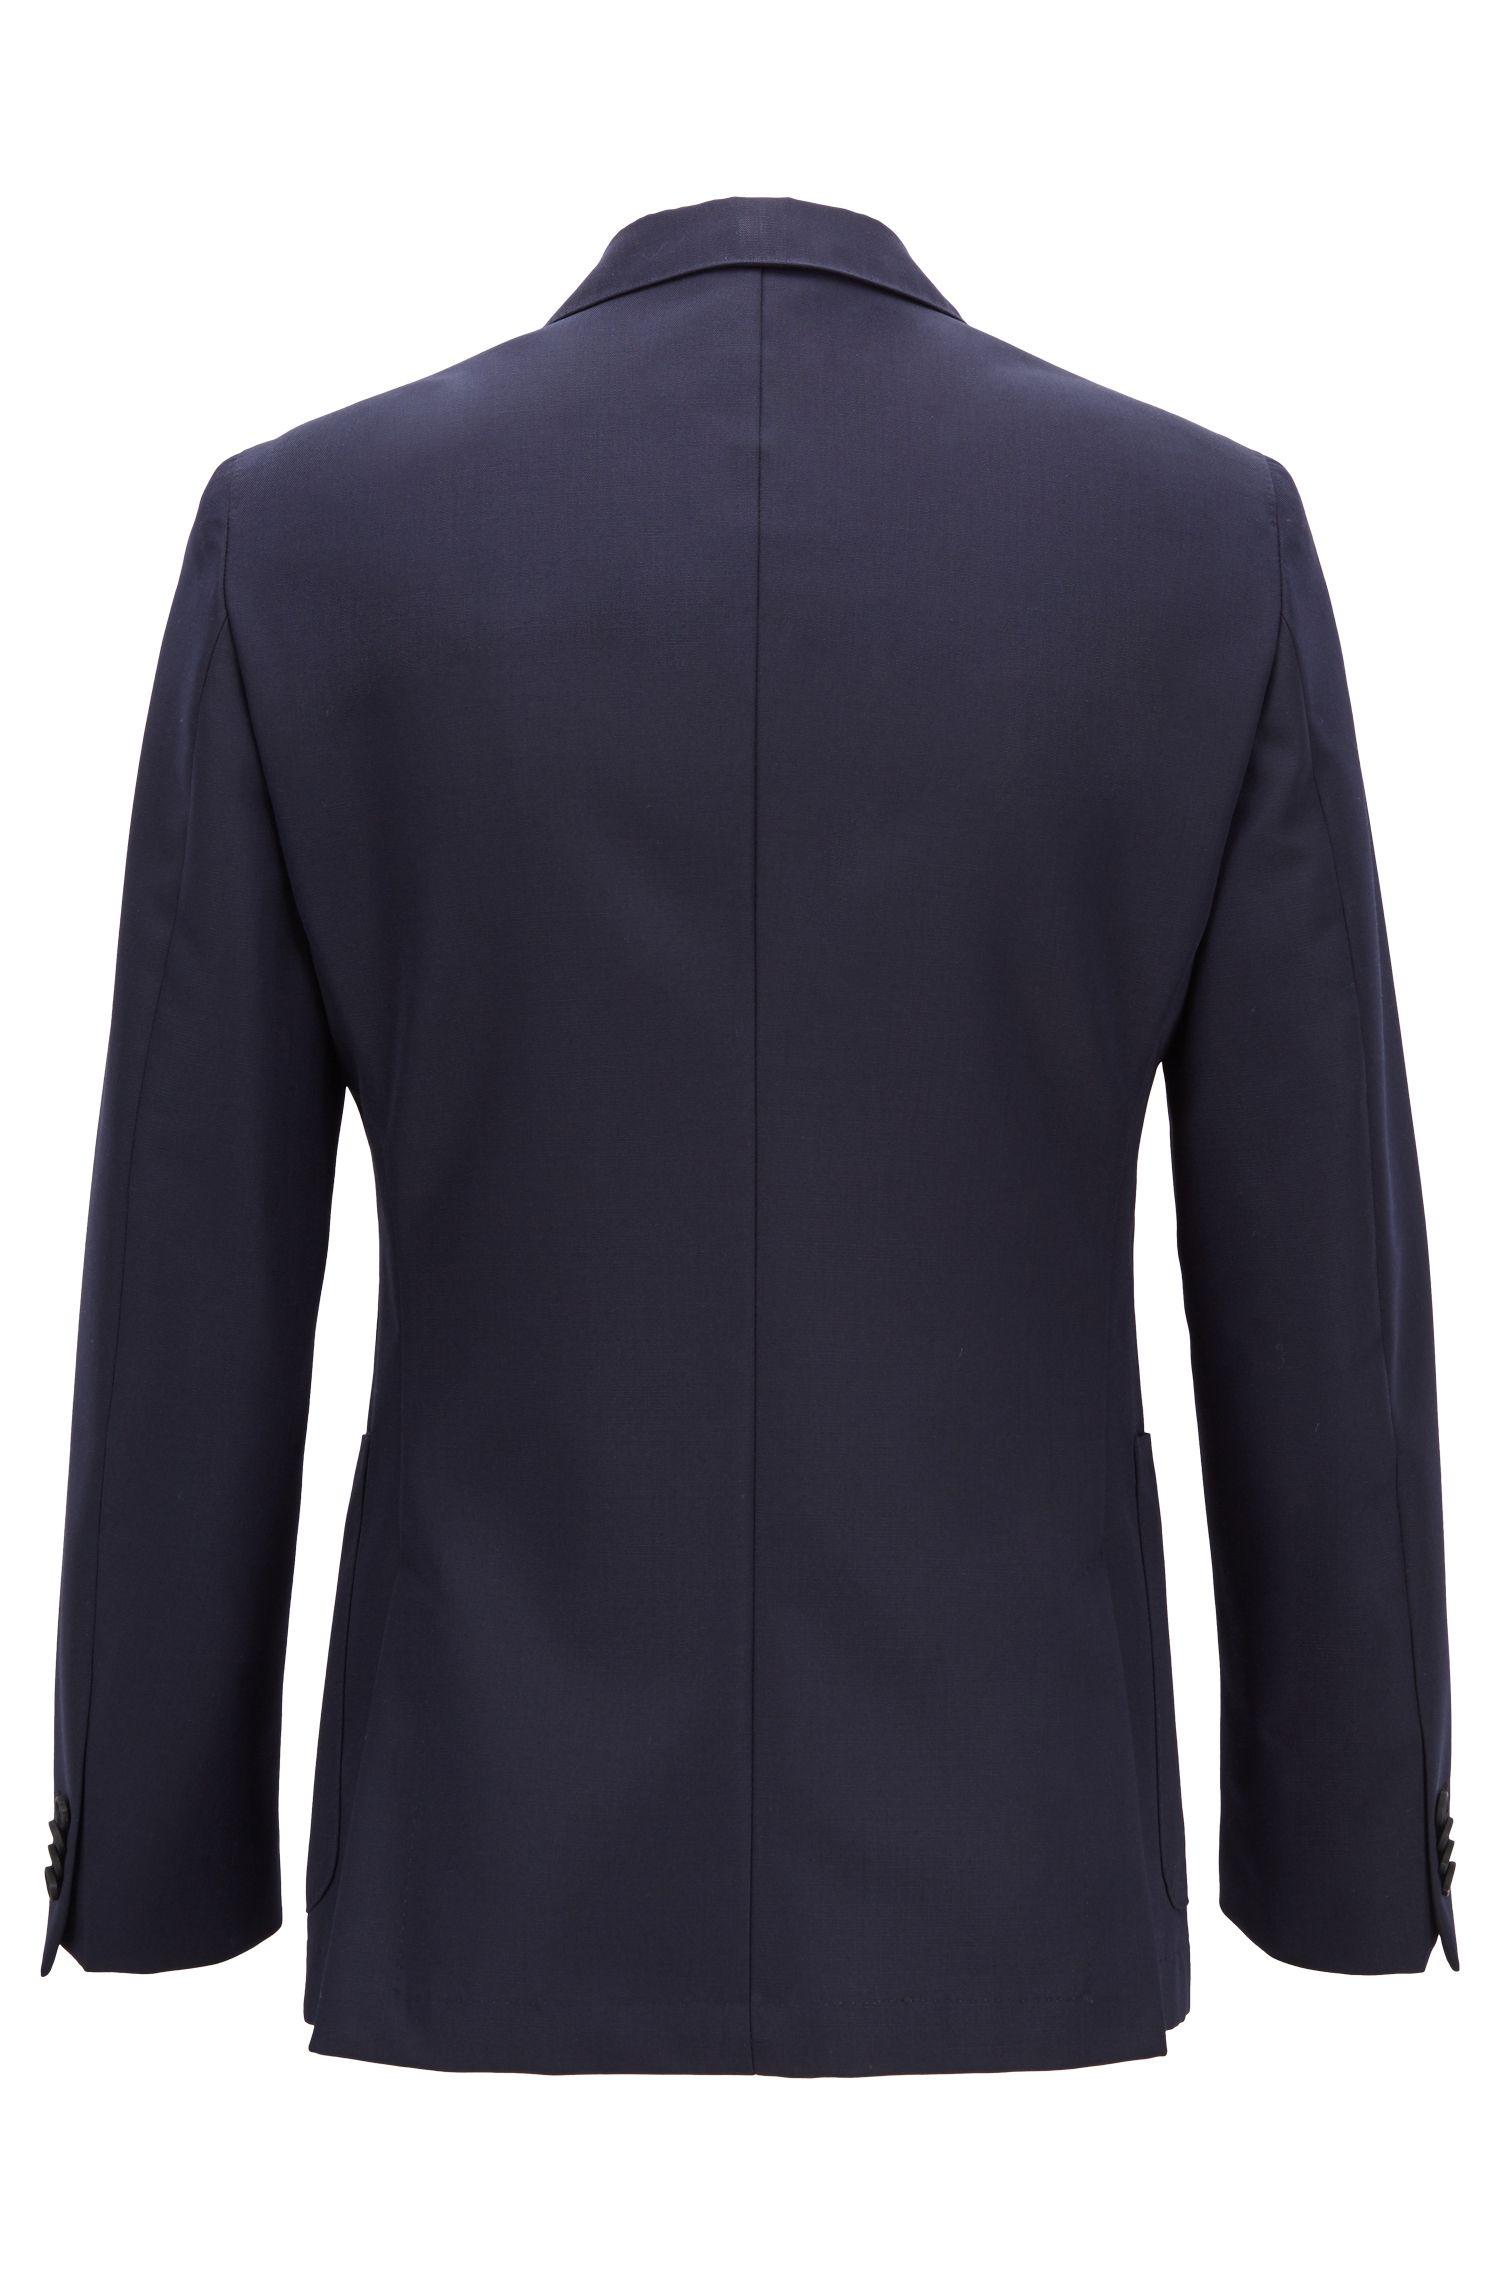 Travel Line slim-fit jacket in a wool blend, Open Blue